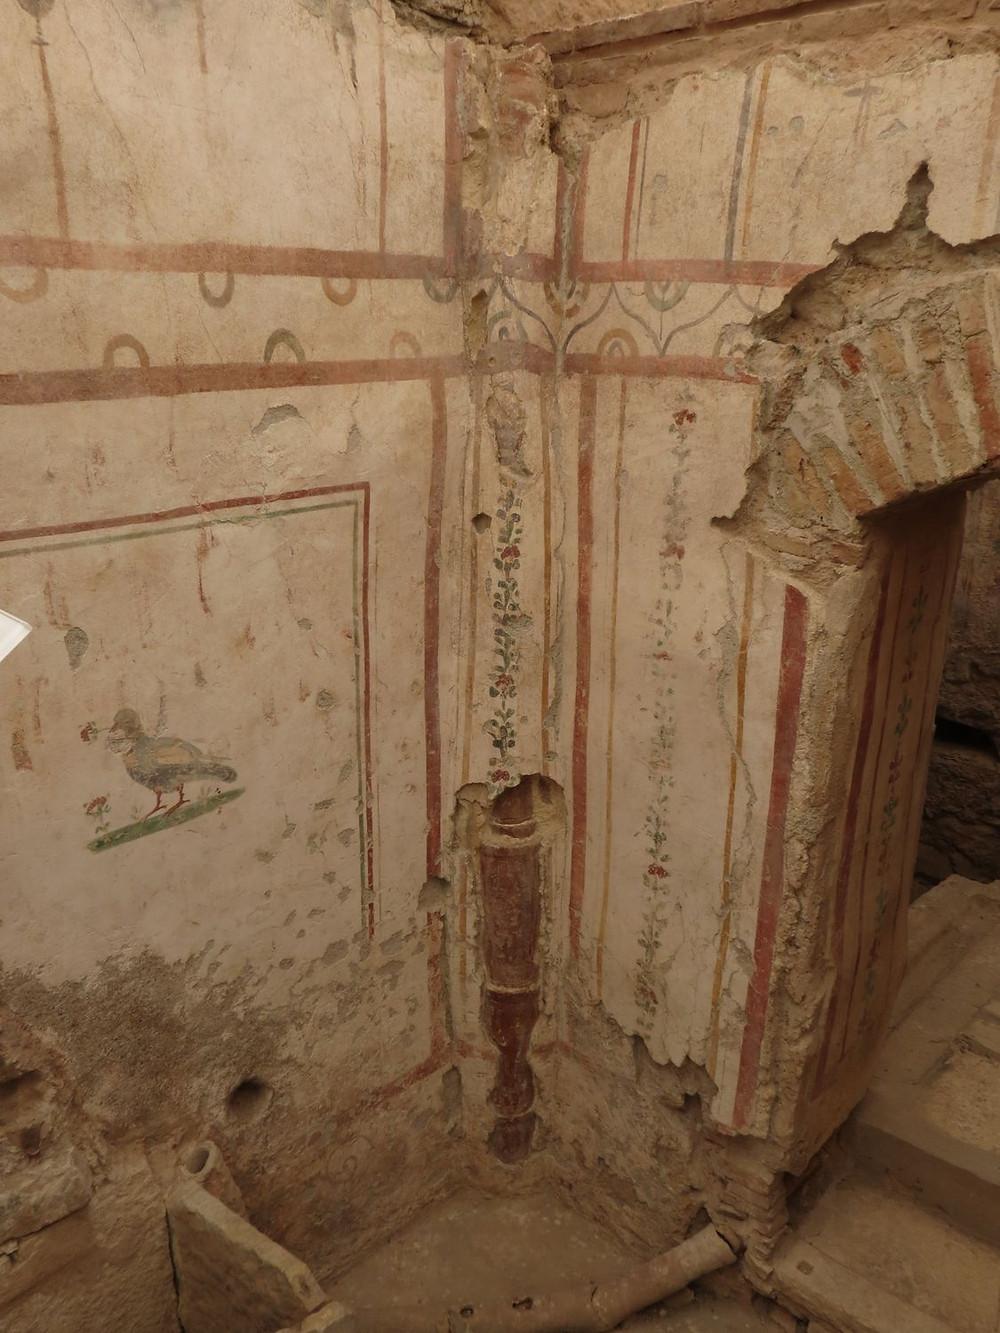 Ephesus Frescos and Plumbing System